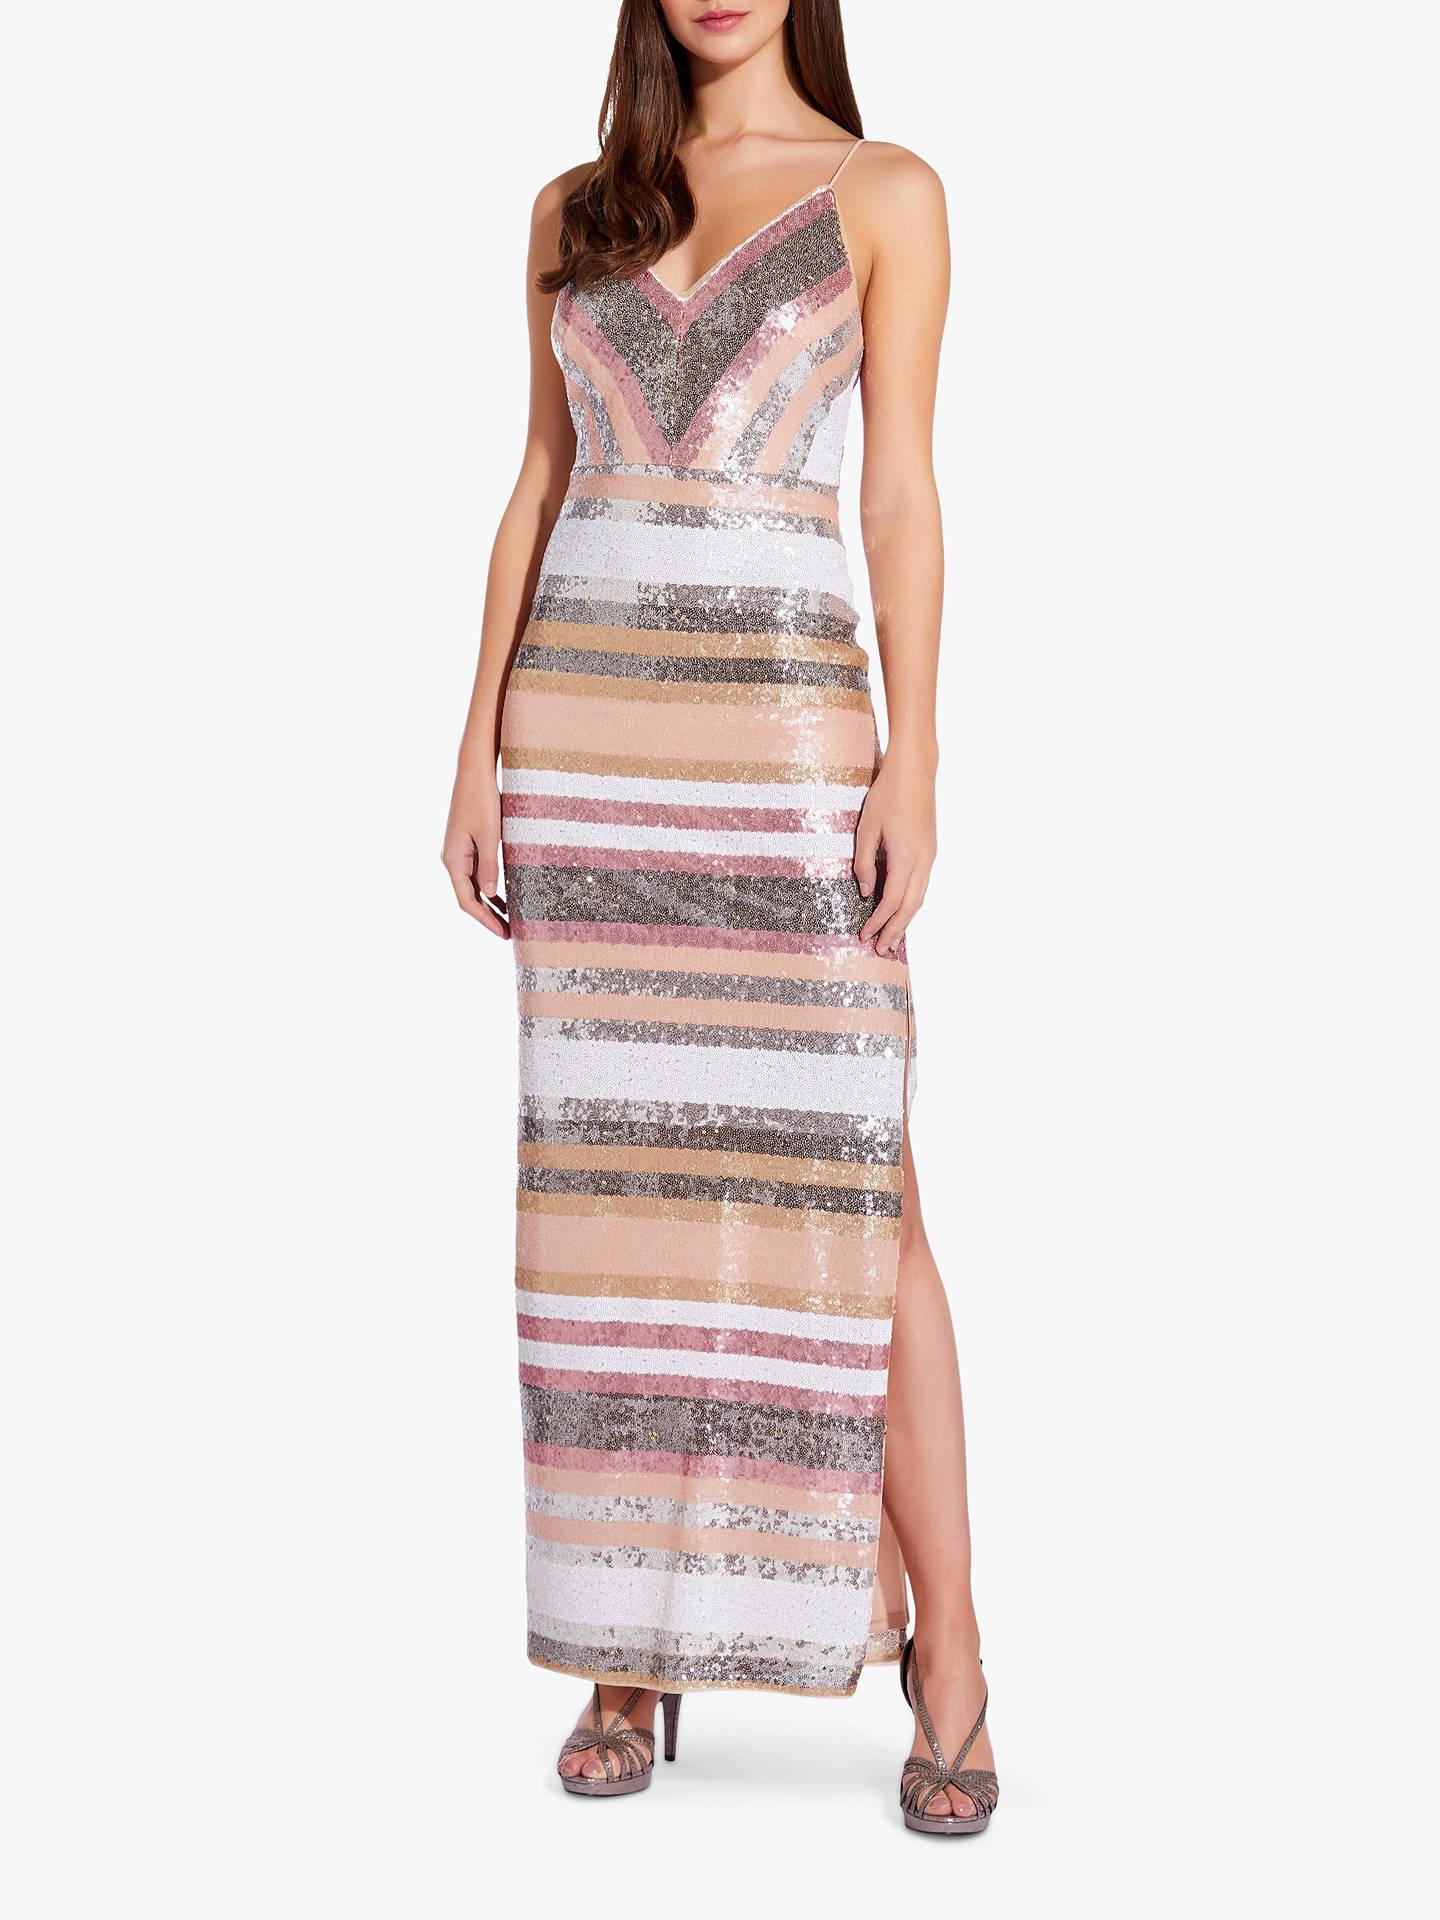 8bedc42b784e9 Adrianna Papell Sequin Stripe Spaghetti Strap Gown, Metallic Blush